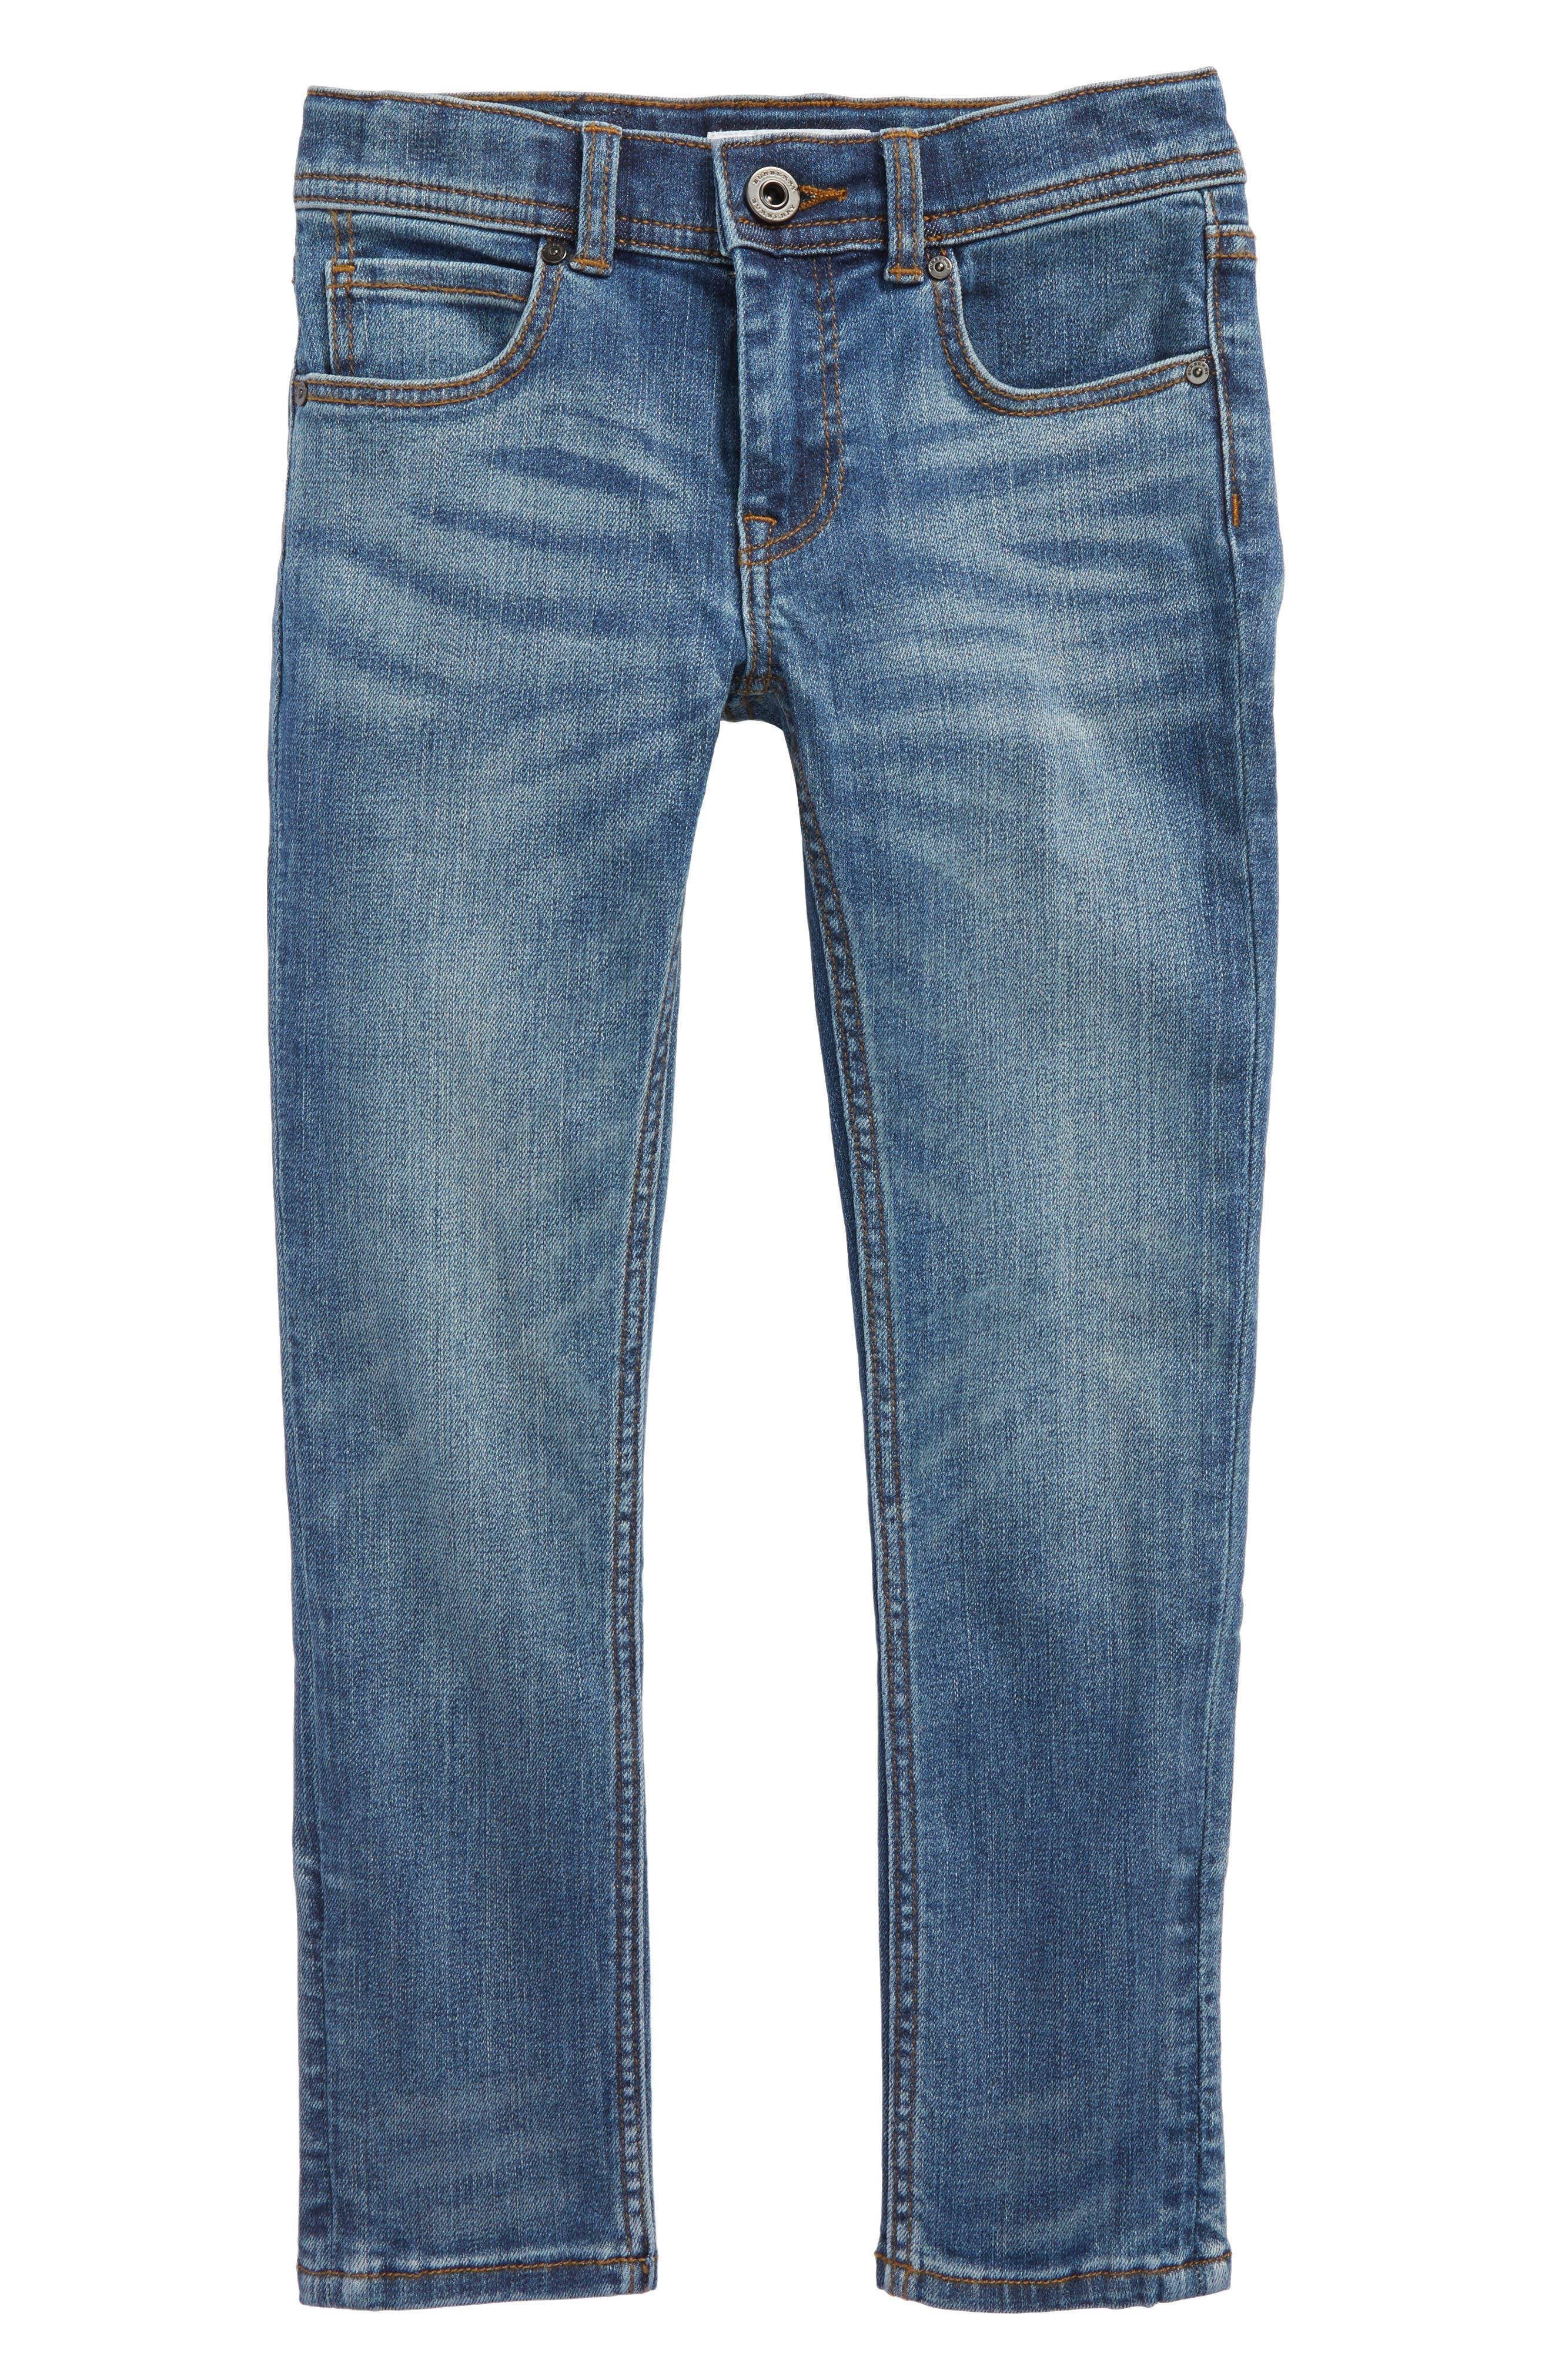 Skinny Jeans,                             Main thumbnail 1, color,                             Mid Indigo